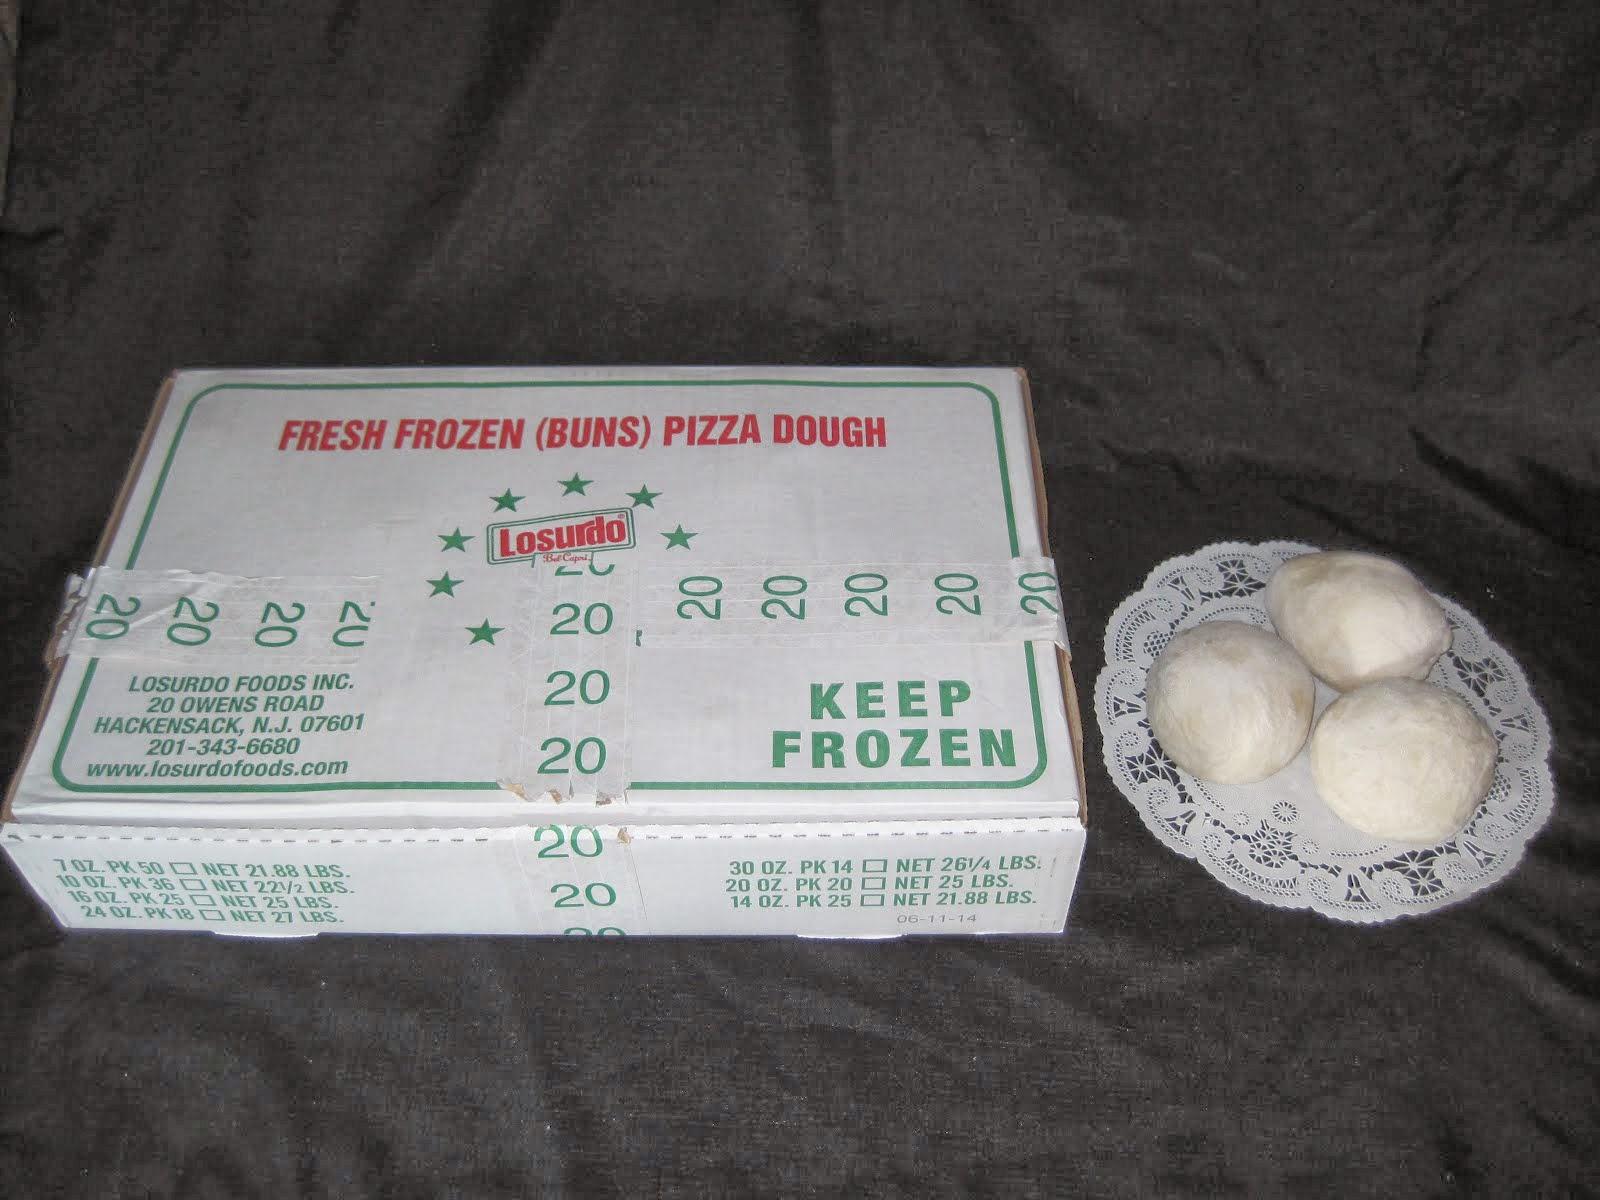 Losurdo Dough Balls 16,20,22, & 24 oz - Item # 27475, 27480, 27500, & 27505